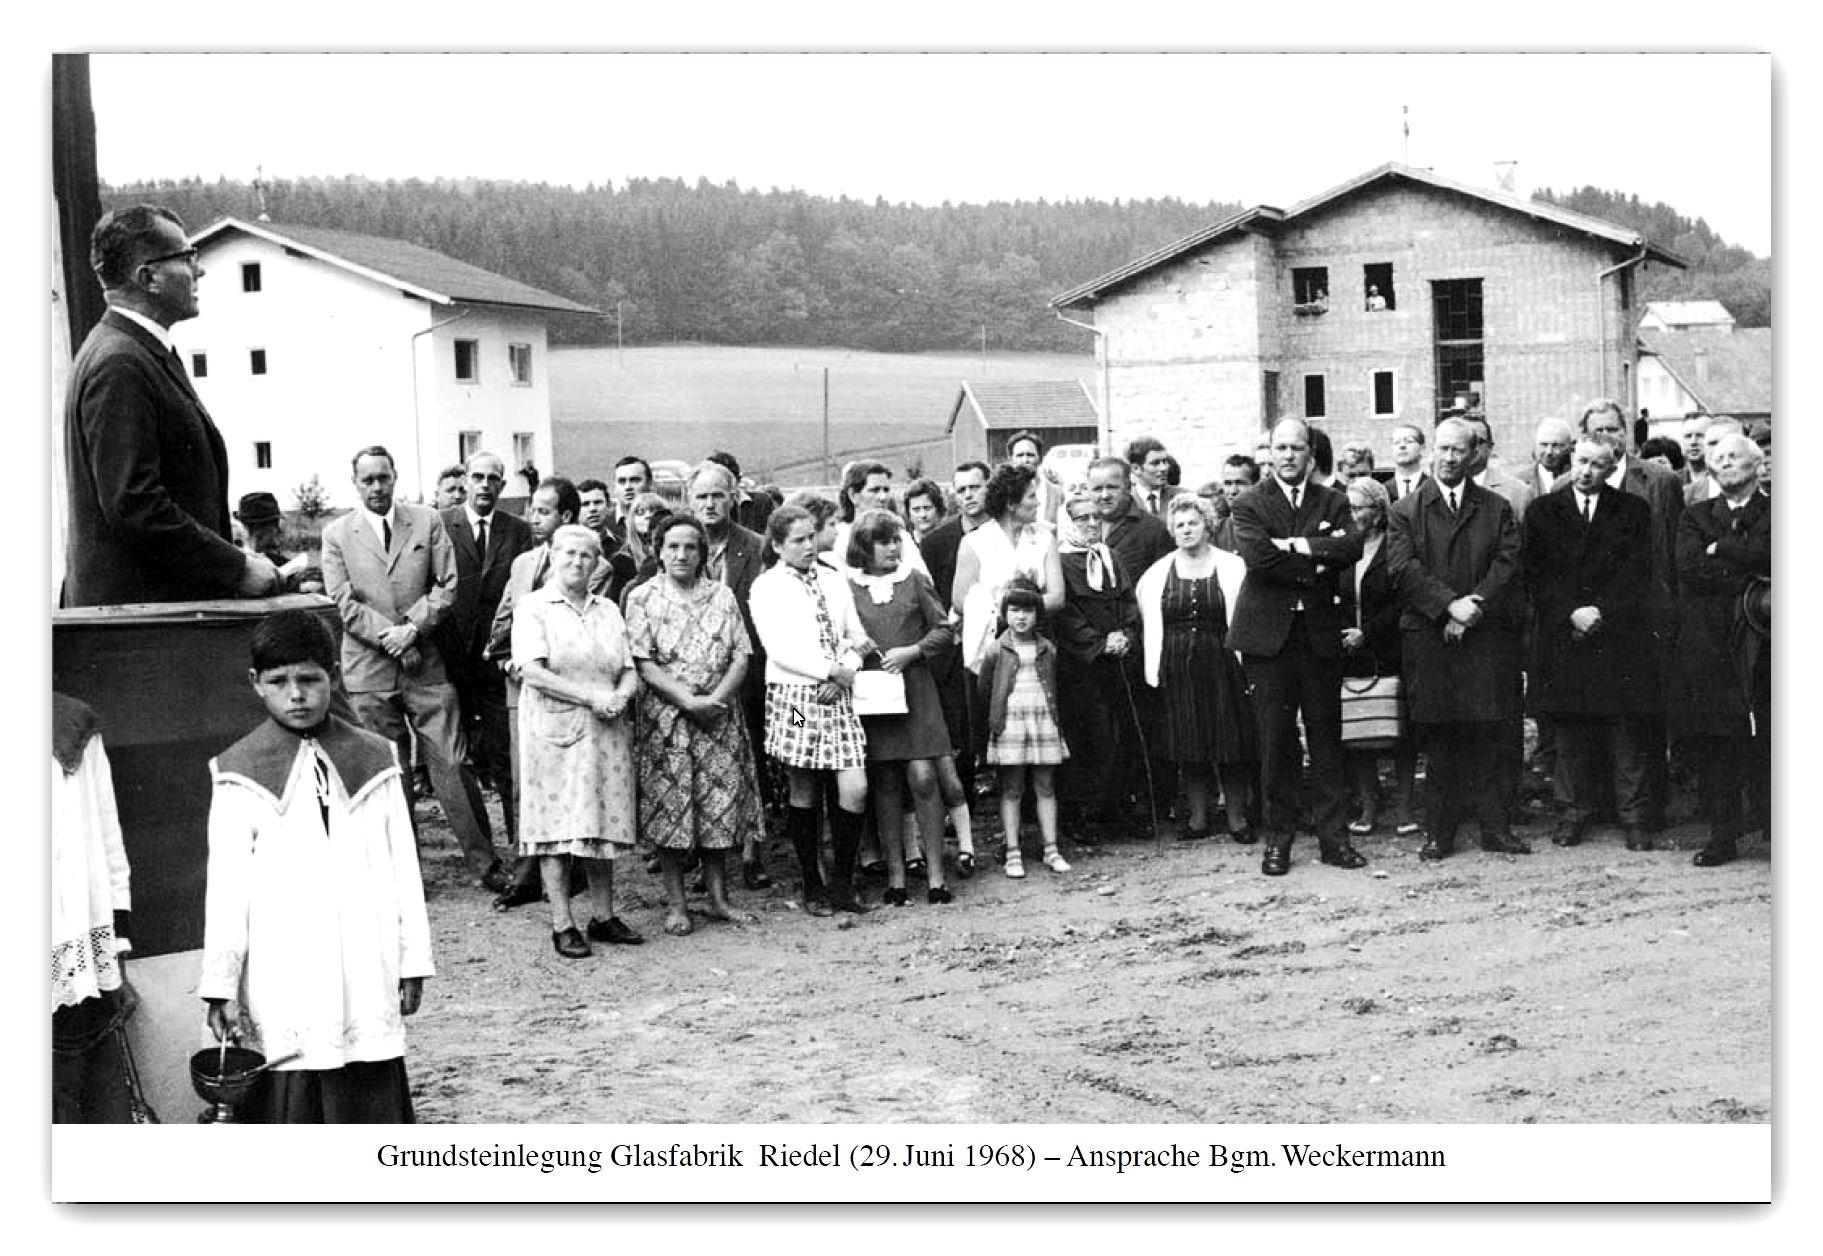 https://0501.nccdn.net/4_2/000/000/009/b39/Grunsteinlegung-Glasfabrik-Riedel-BM-Weckermann-29.-Juni-1968.jpg